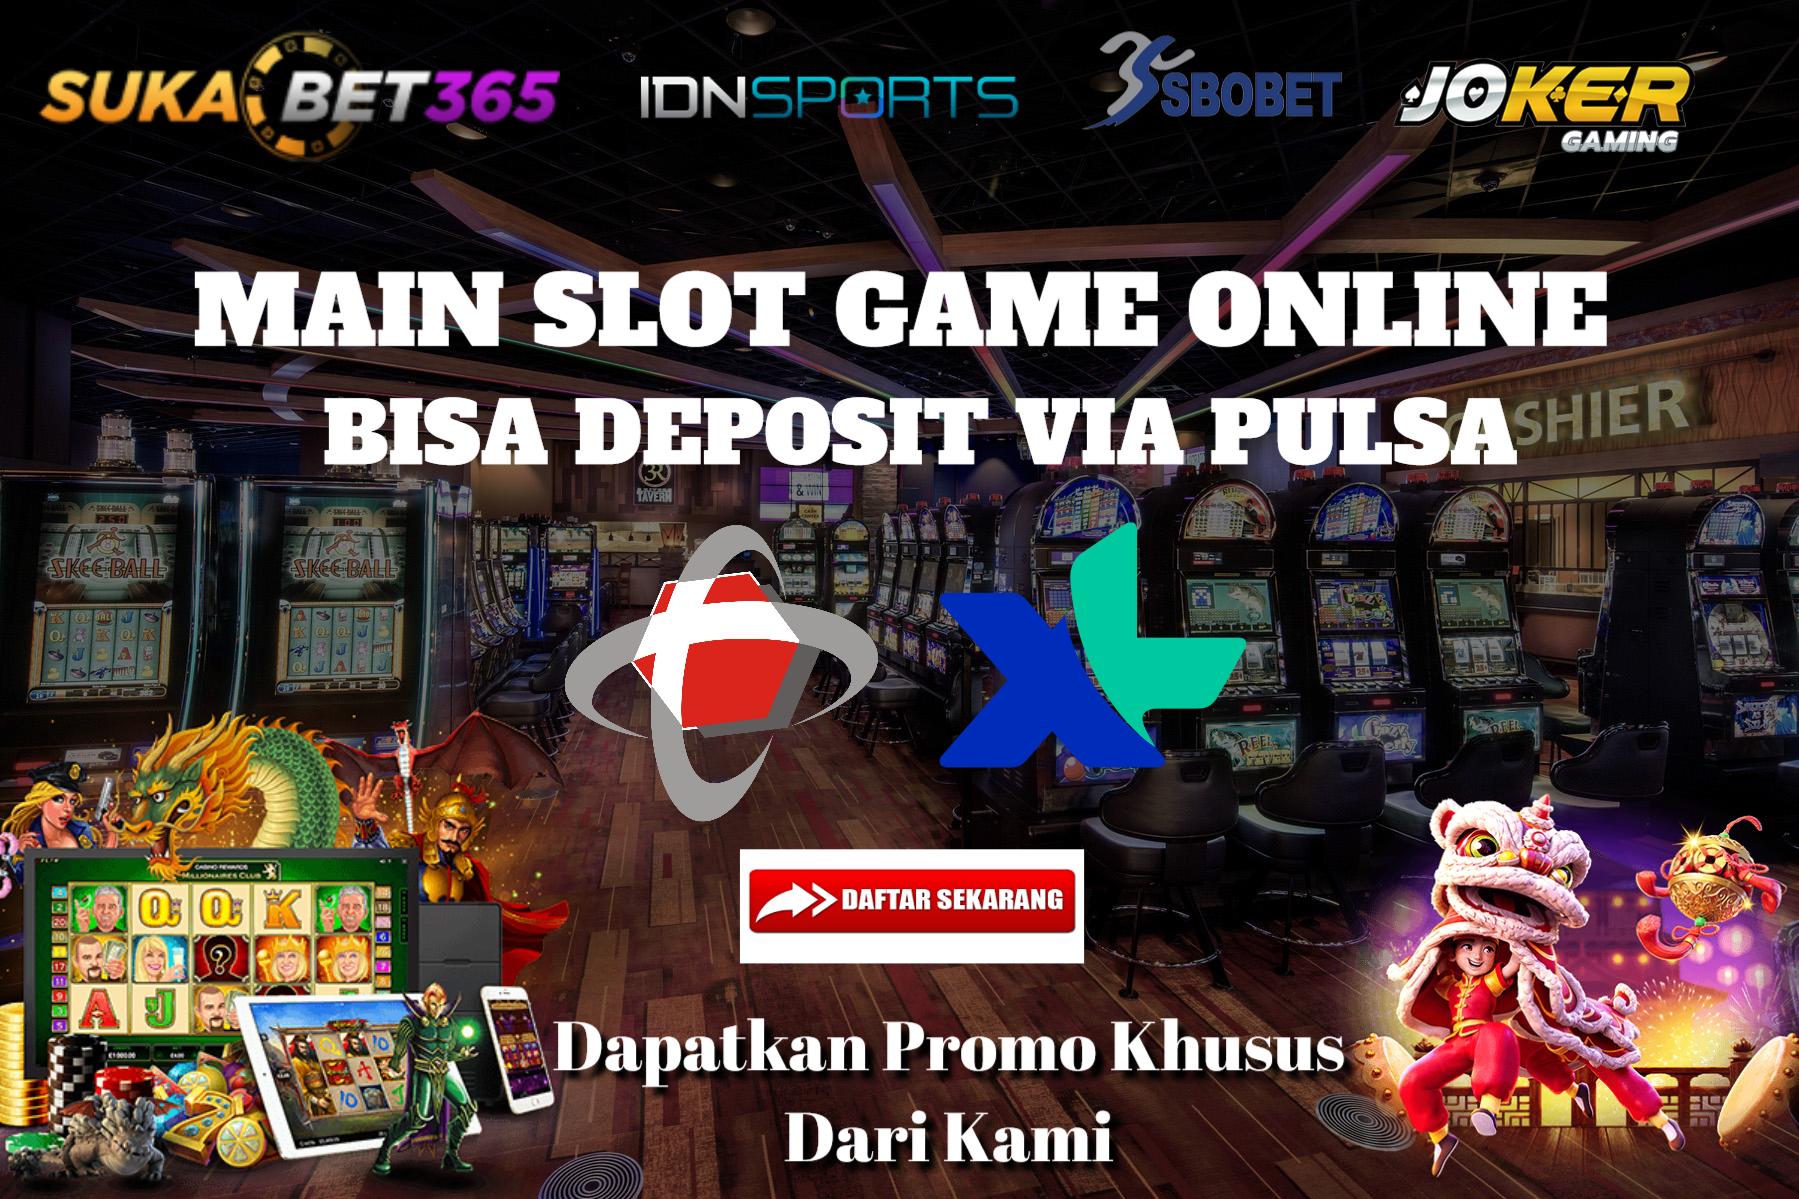 Agen Slot Online Deposit Pulsa Joker Mainan Game